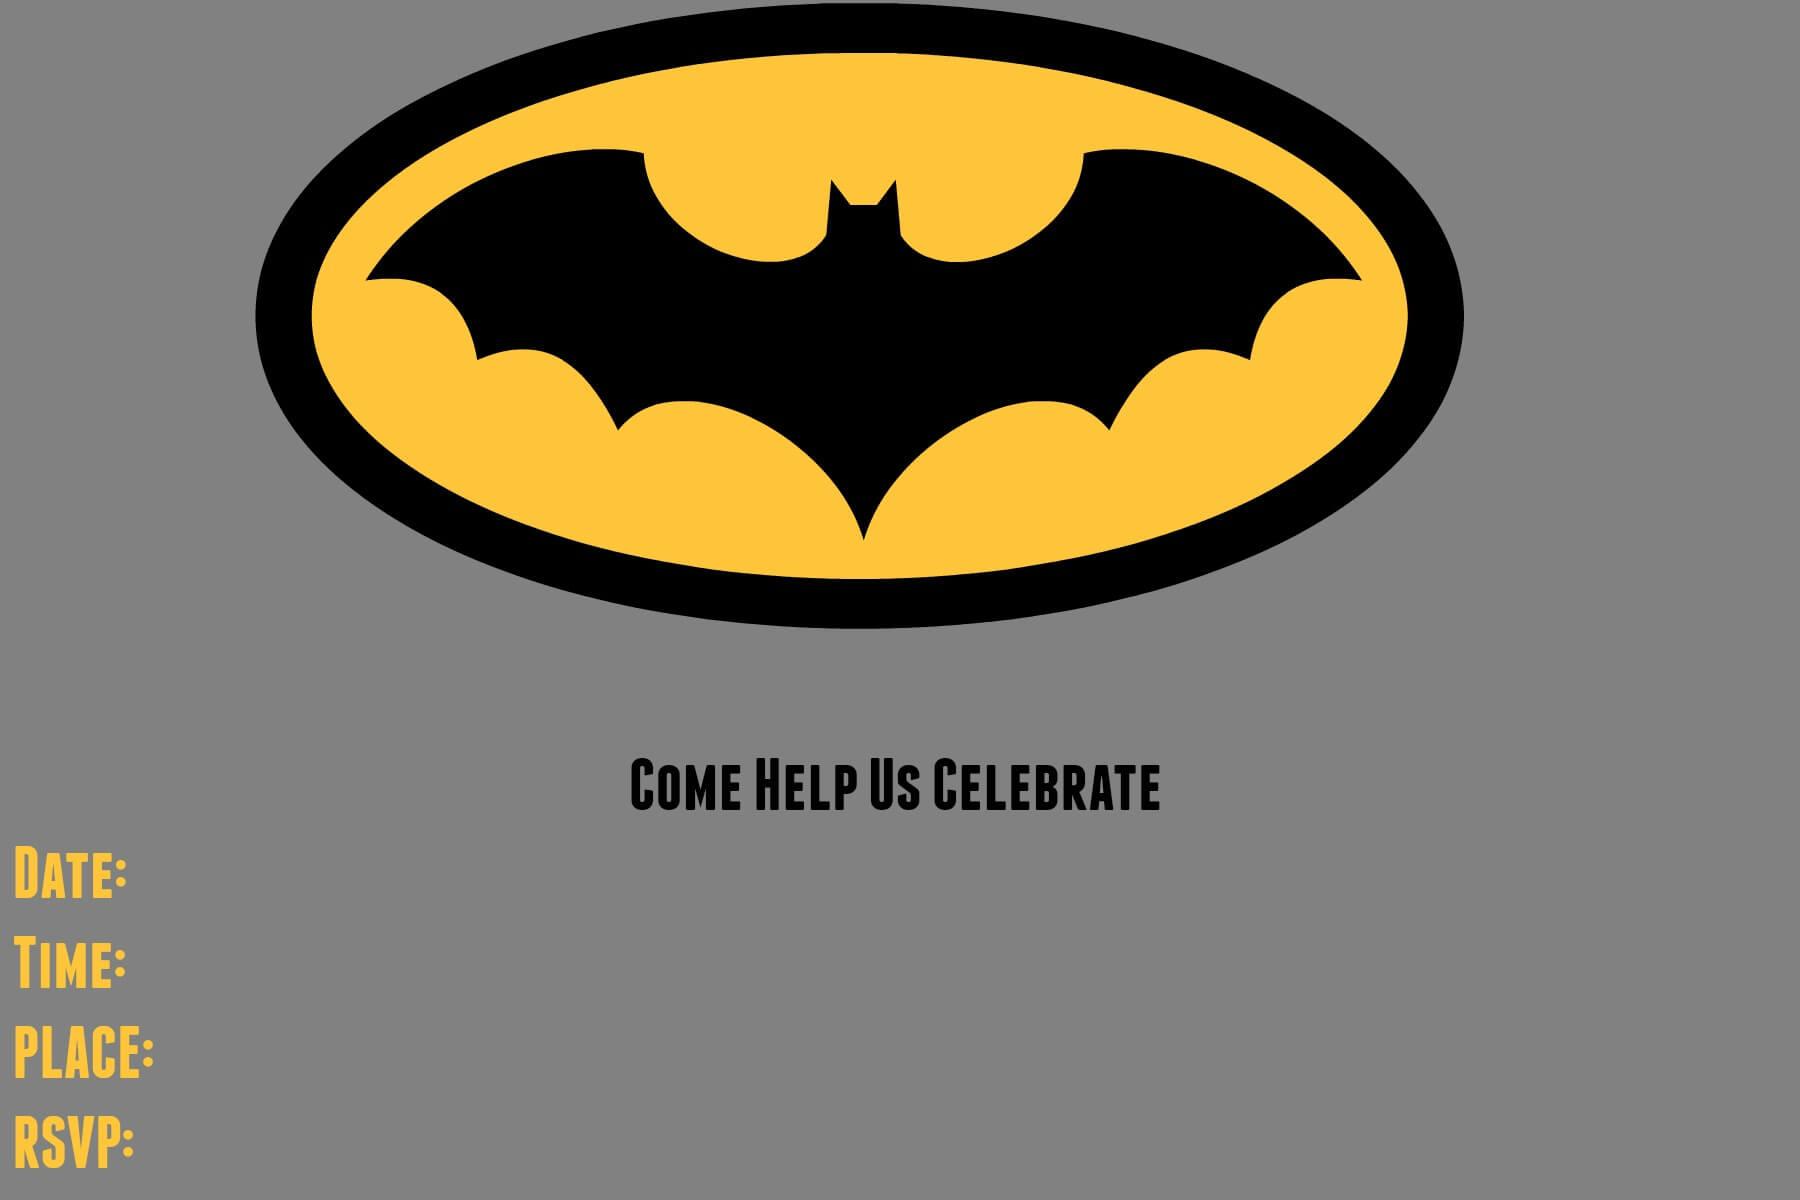 9 Awesome Batman Birthday Invitations   Kittybabylove Throughout Batman Birthday Card Template